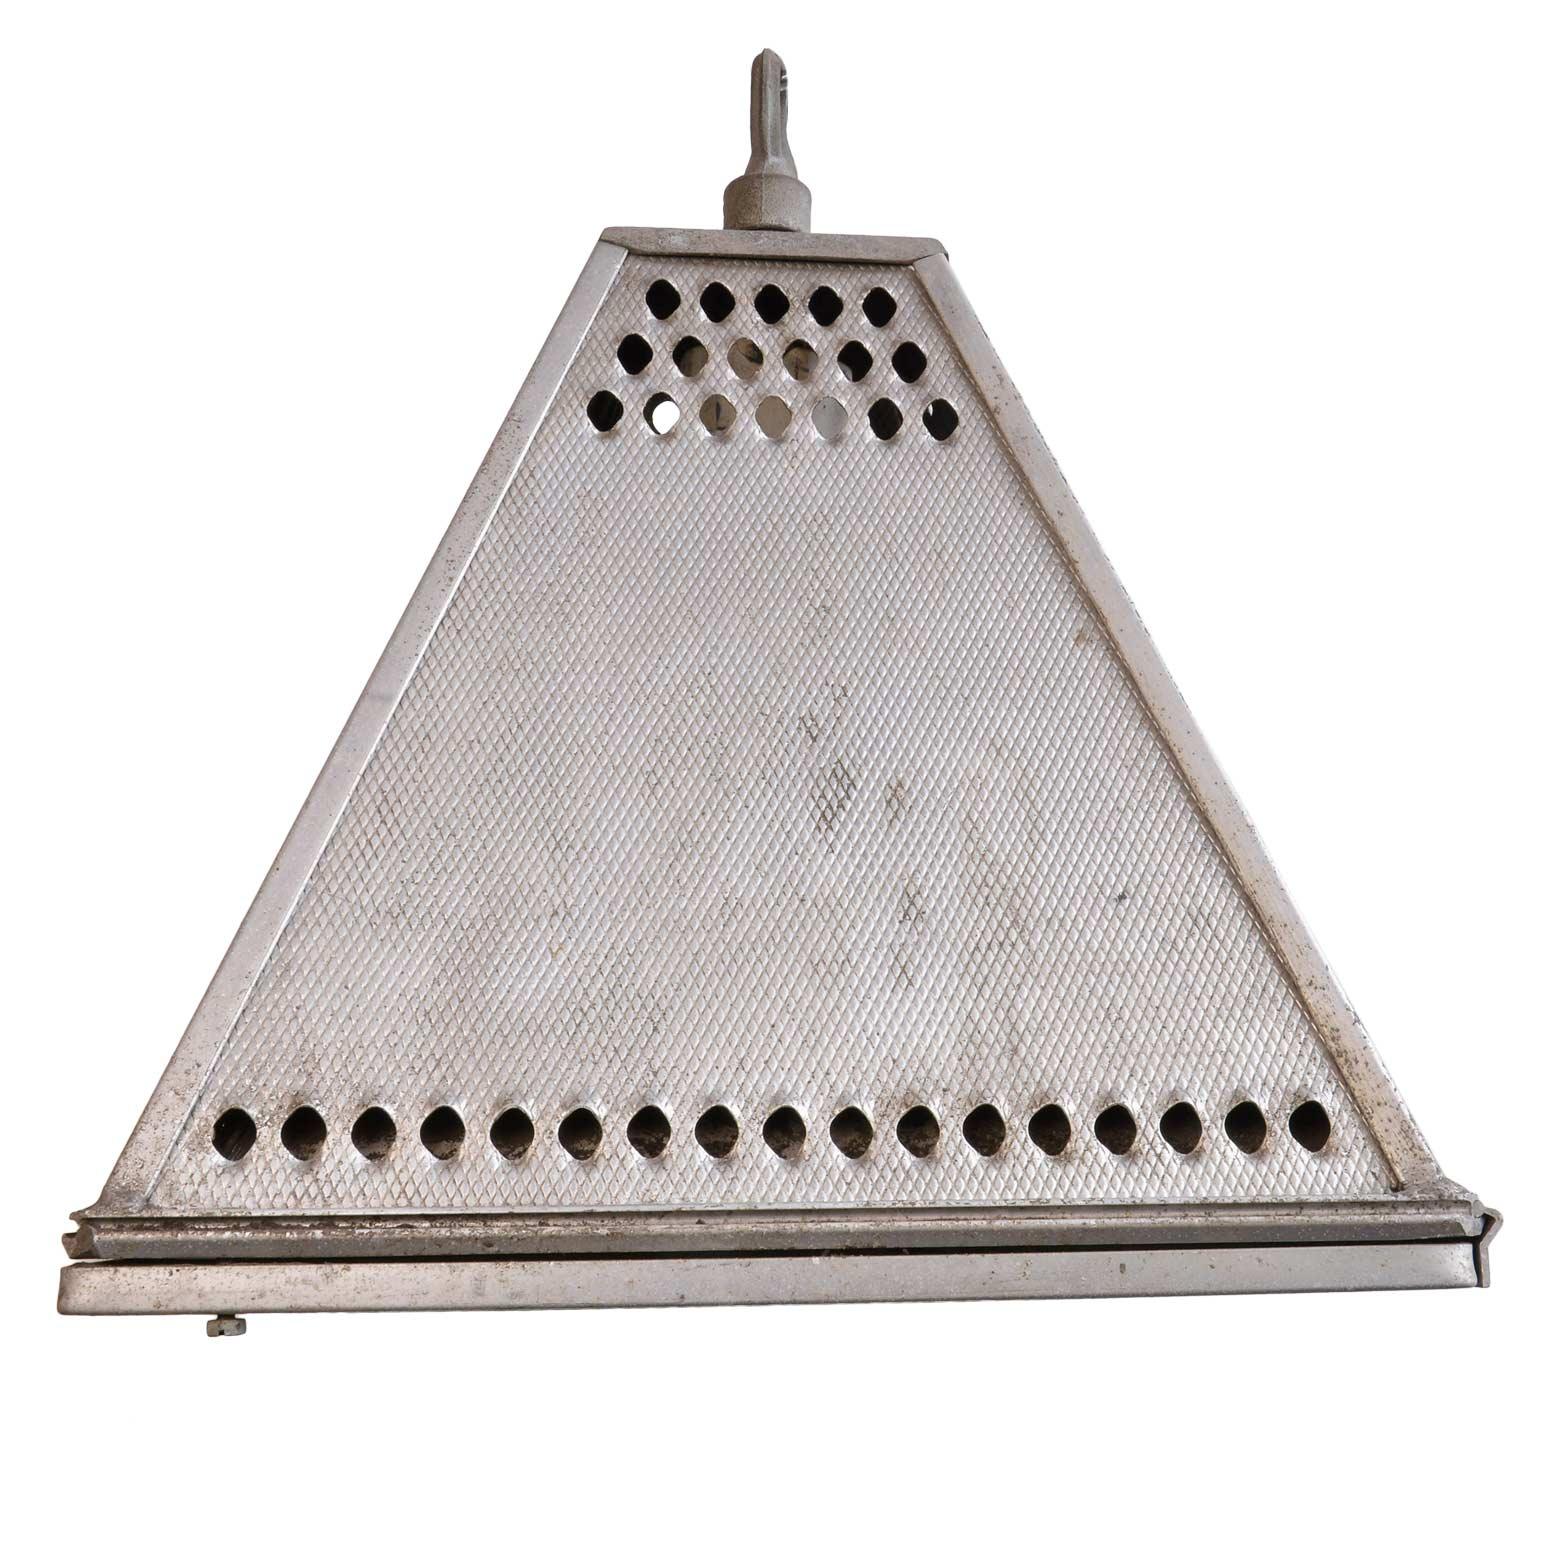 45937-pyramid-industrial-fixture-side.jpg